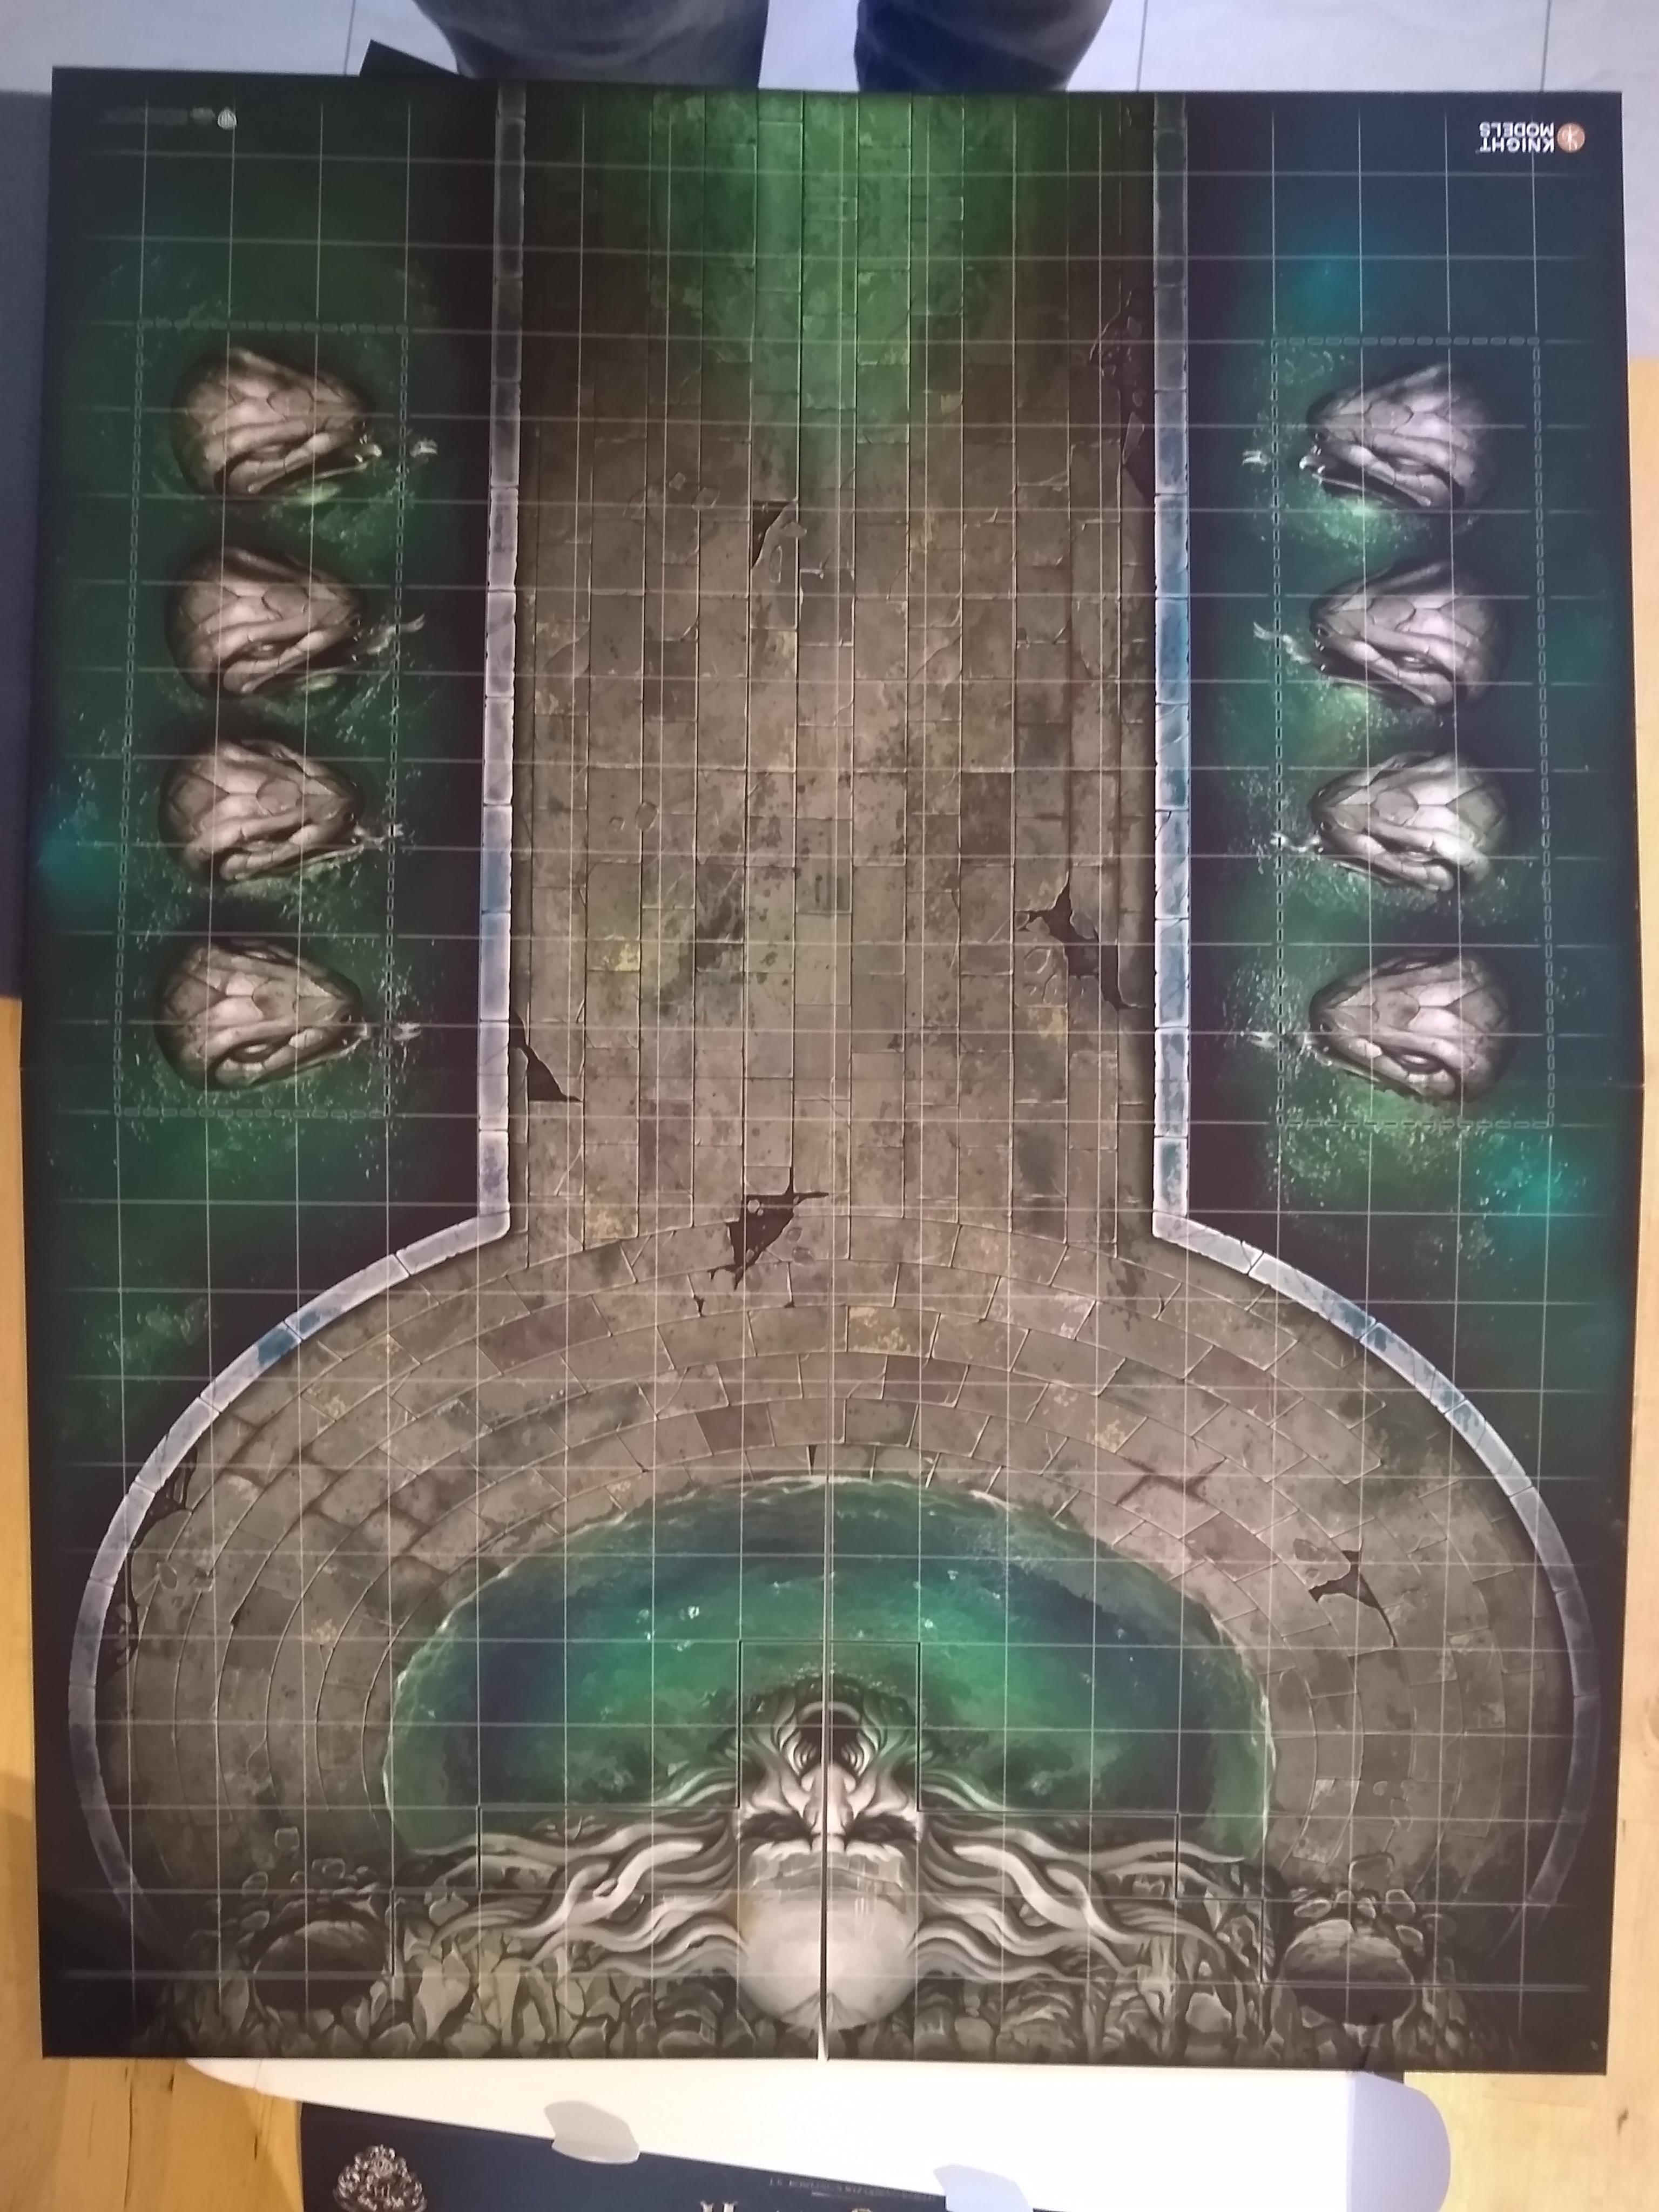 Chamber of Secrets boards